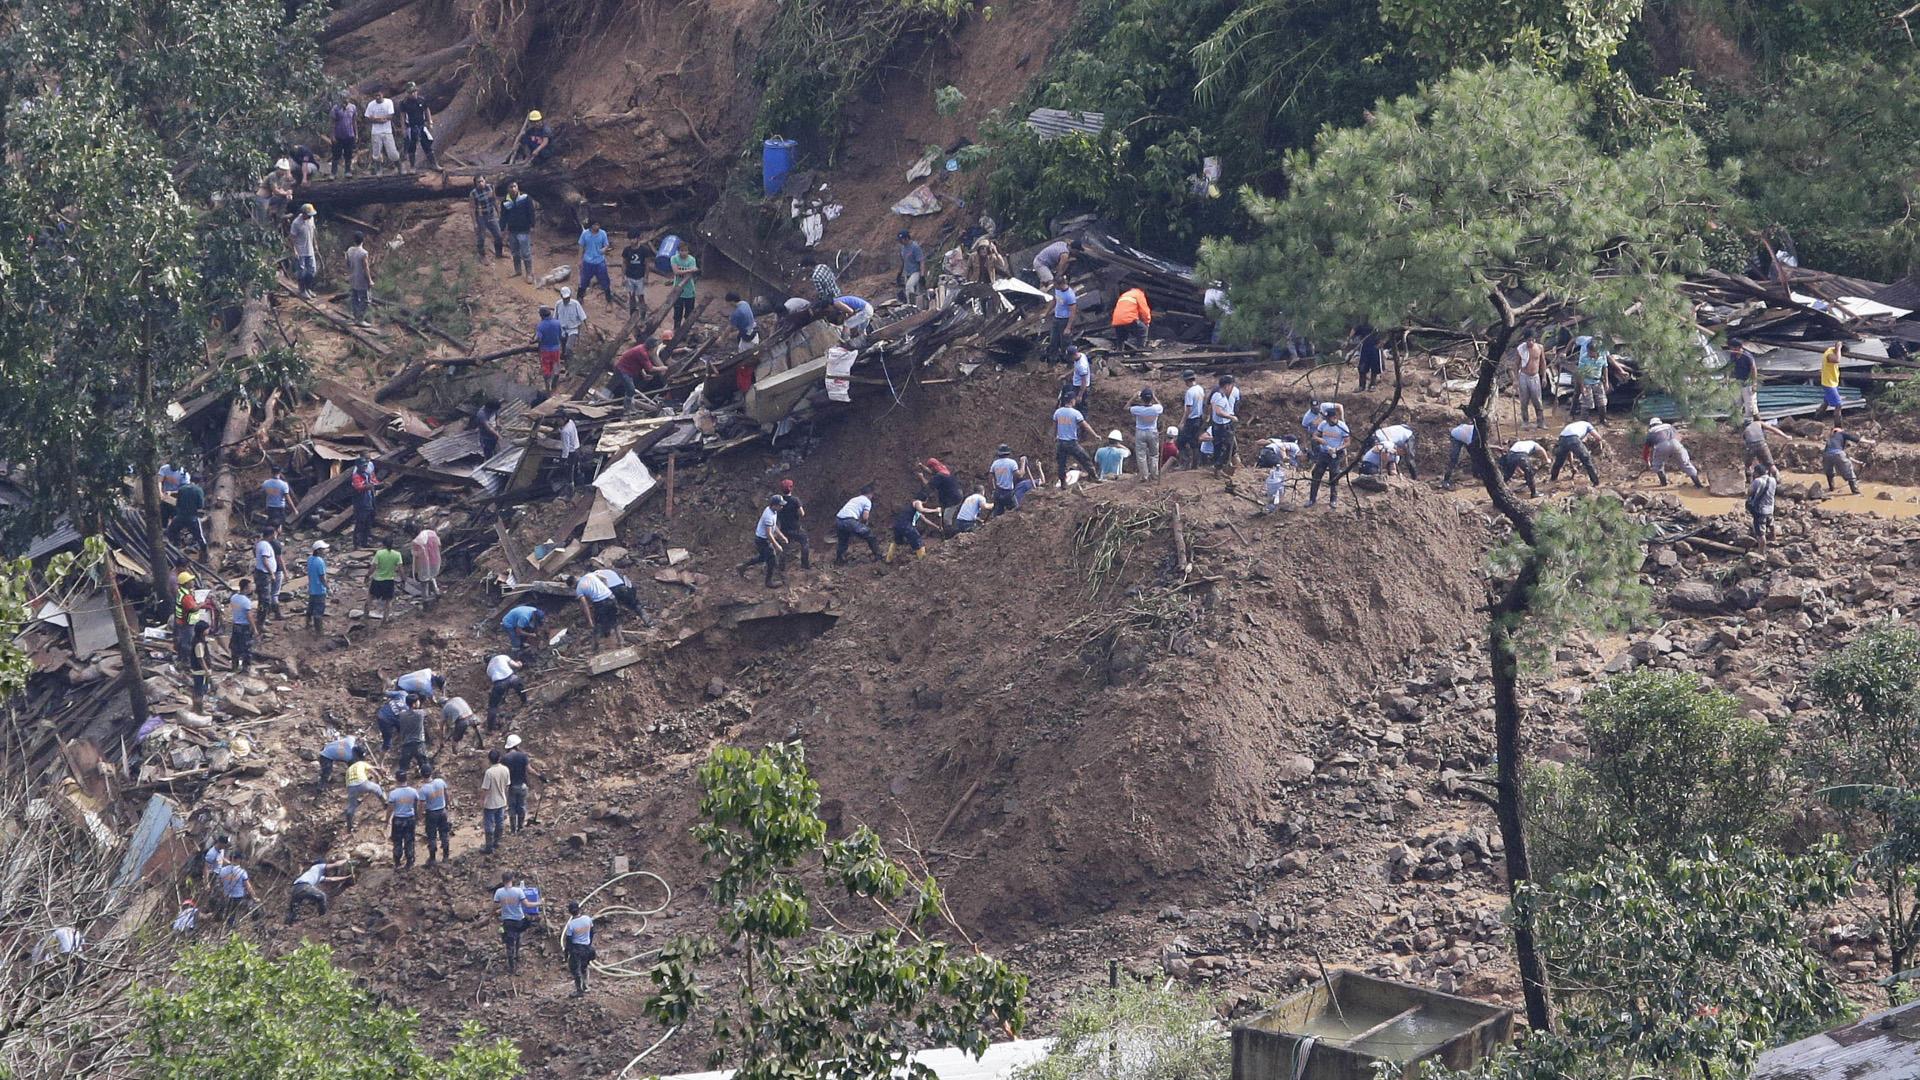 Typhoon Mangkhut Philippines mudslide 091718 AP_1537150918832